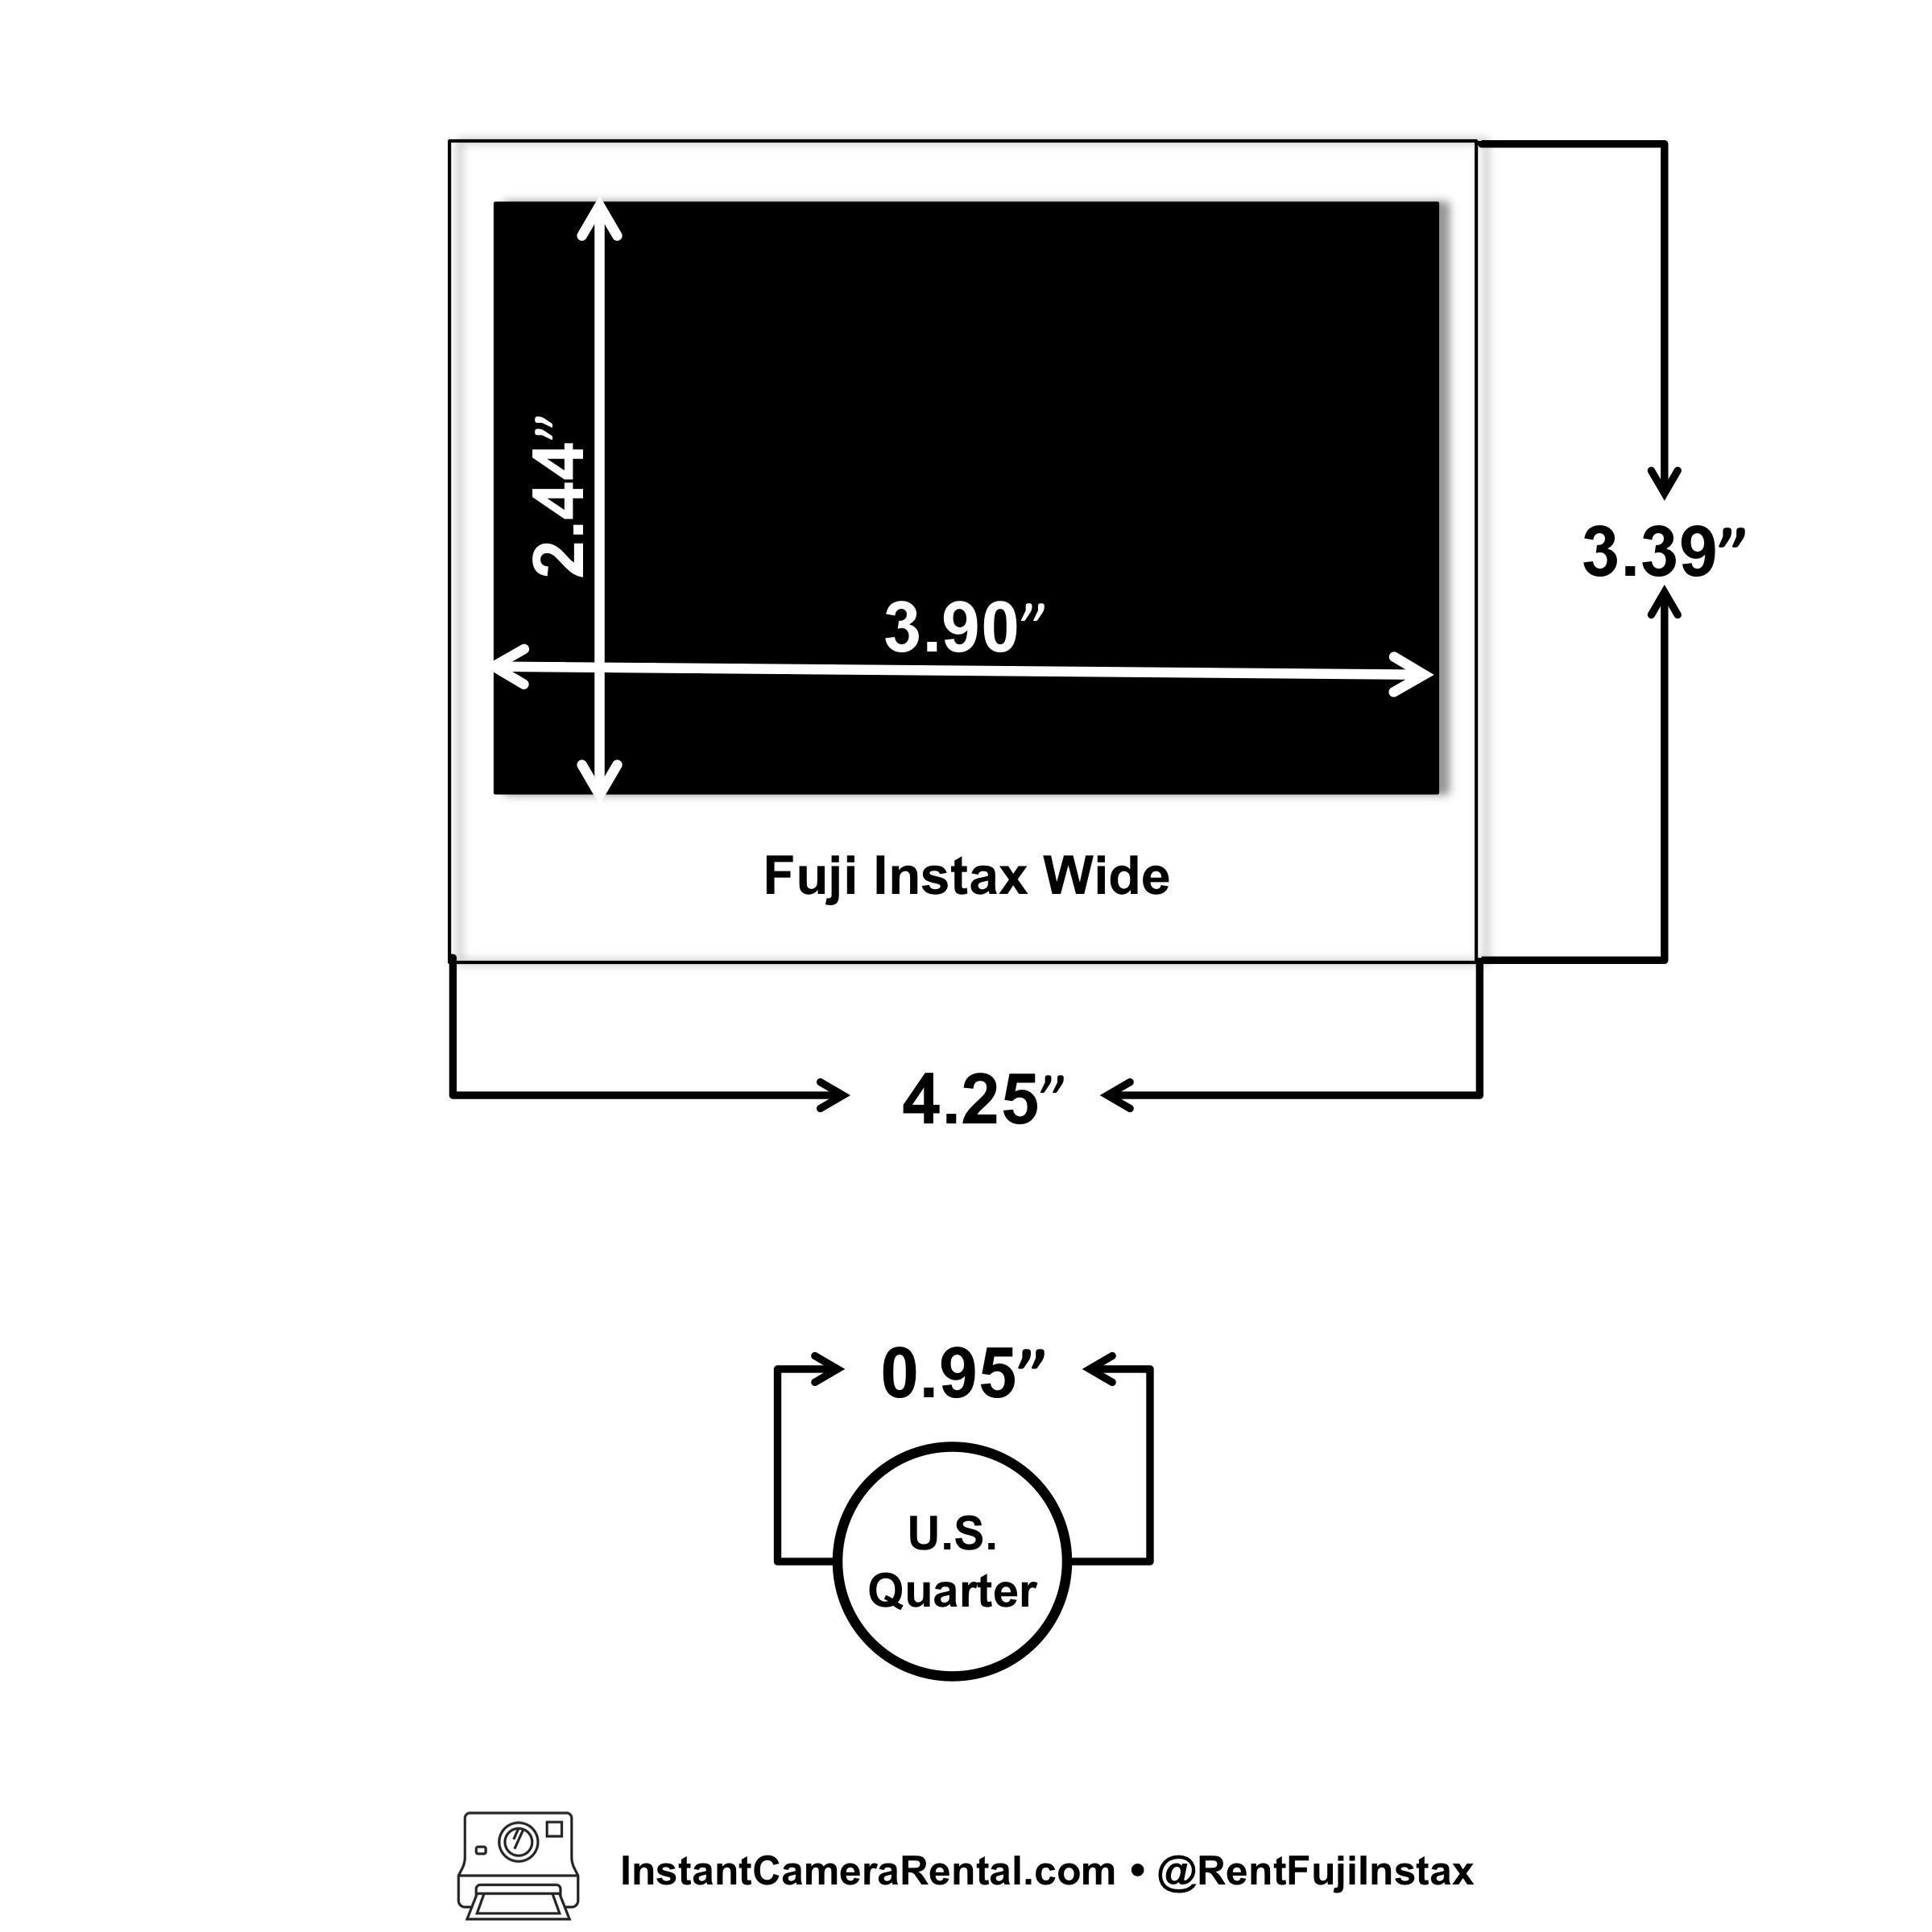 rent polaroids and fuji instax cameras